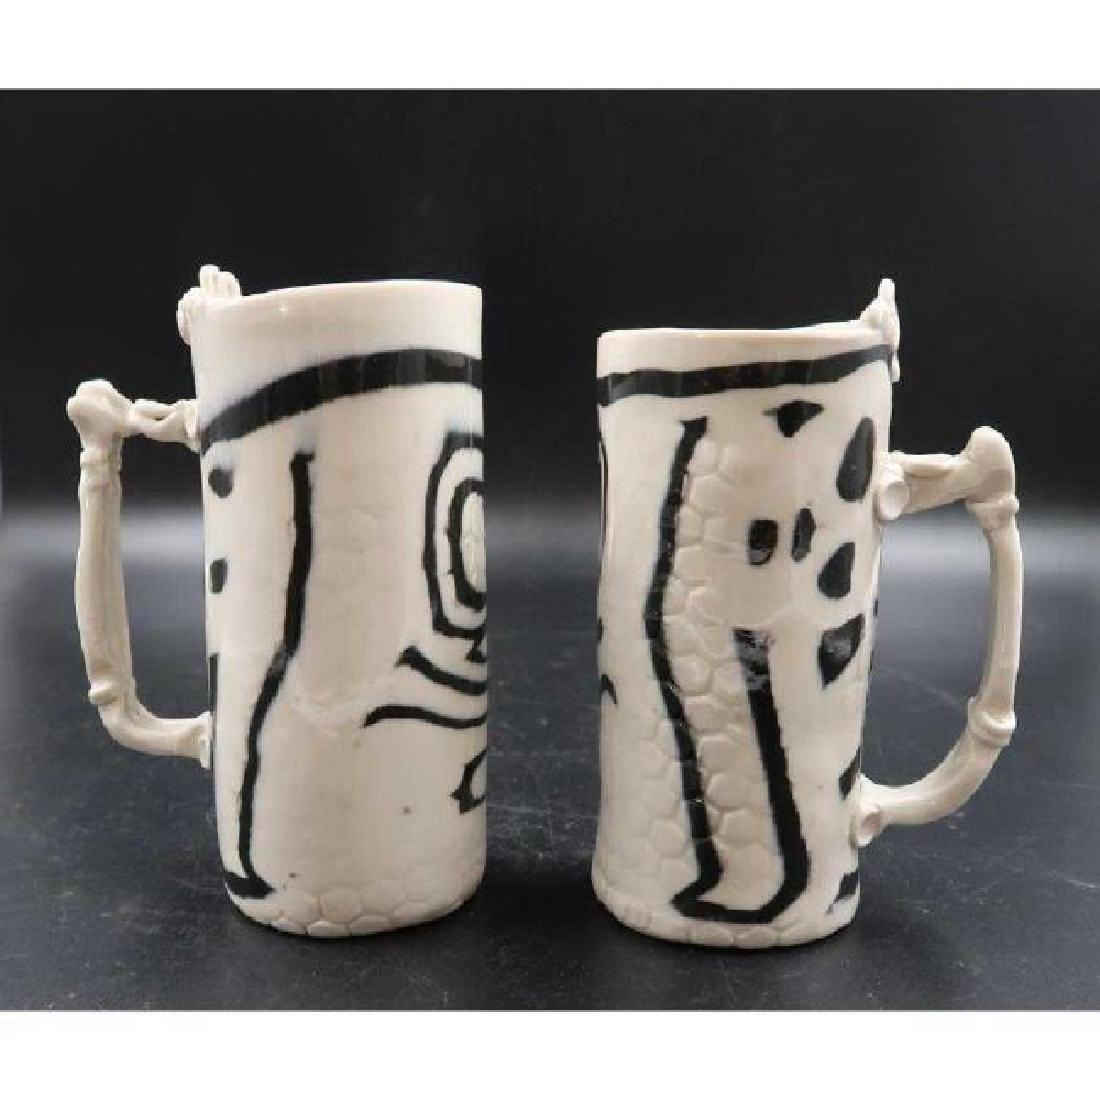 (Pair) signed ceramic mugs